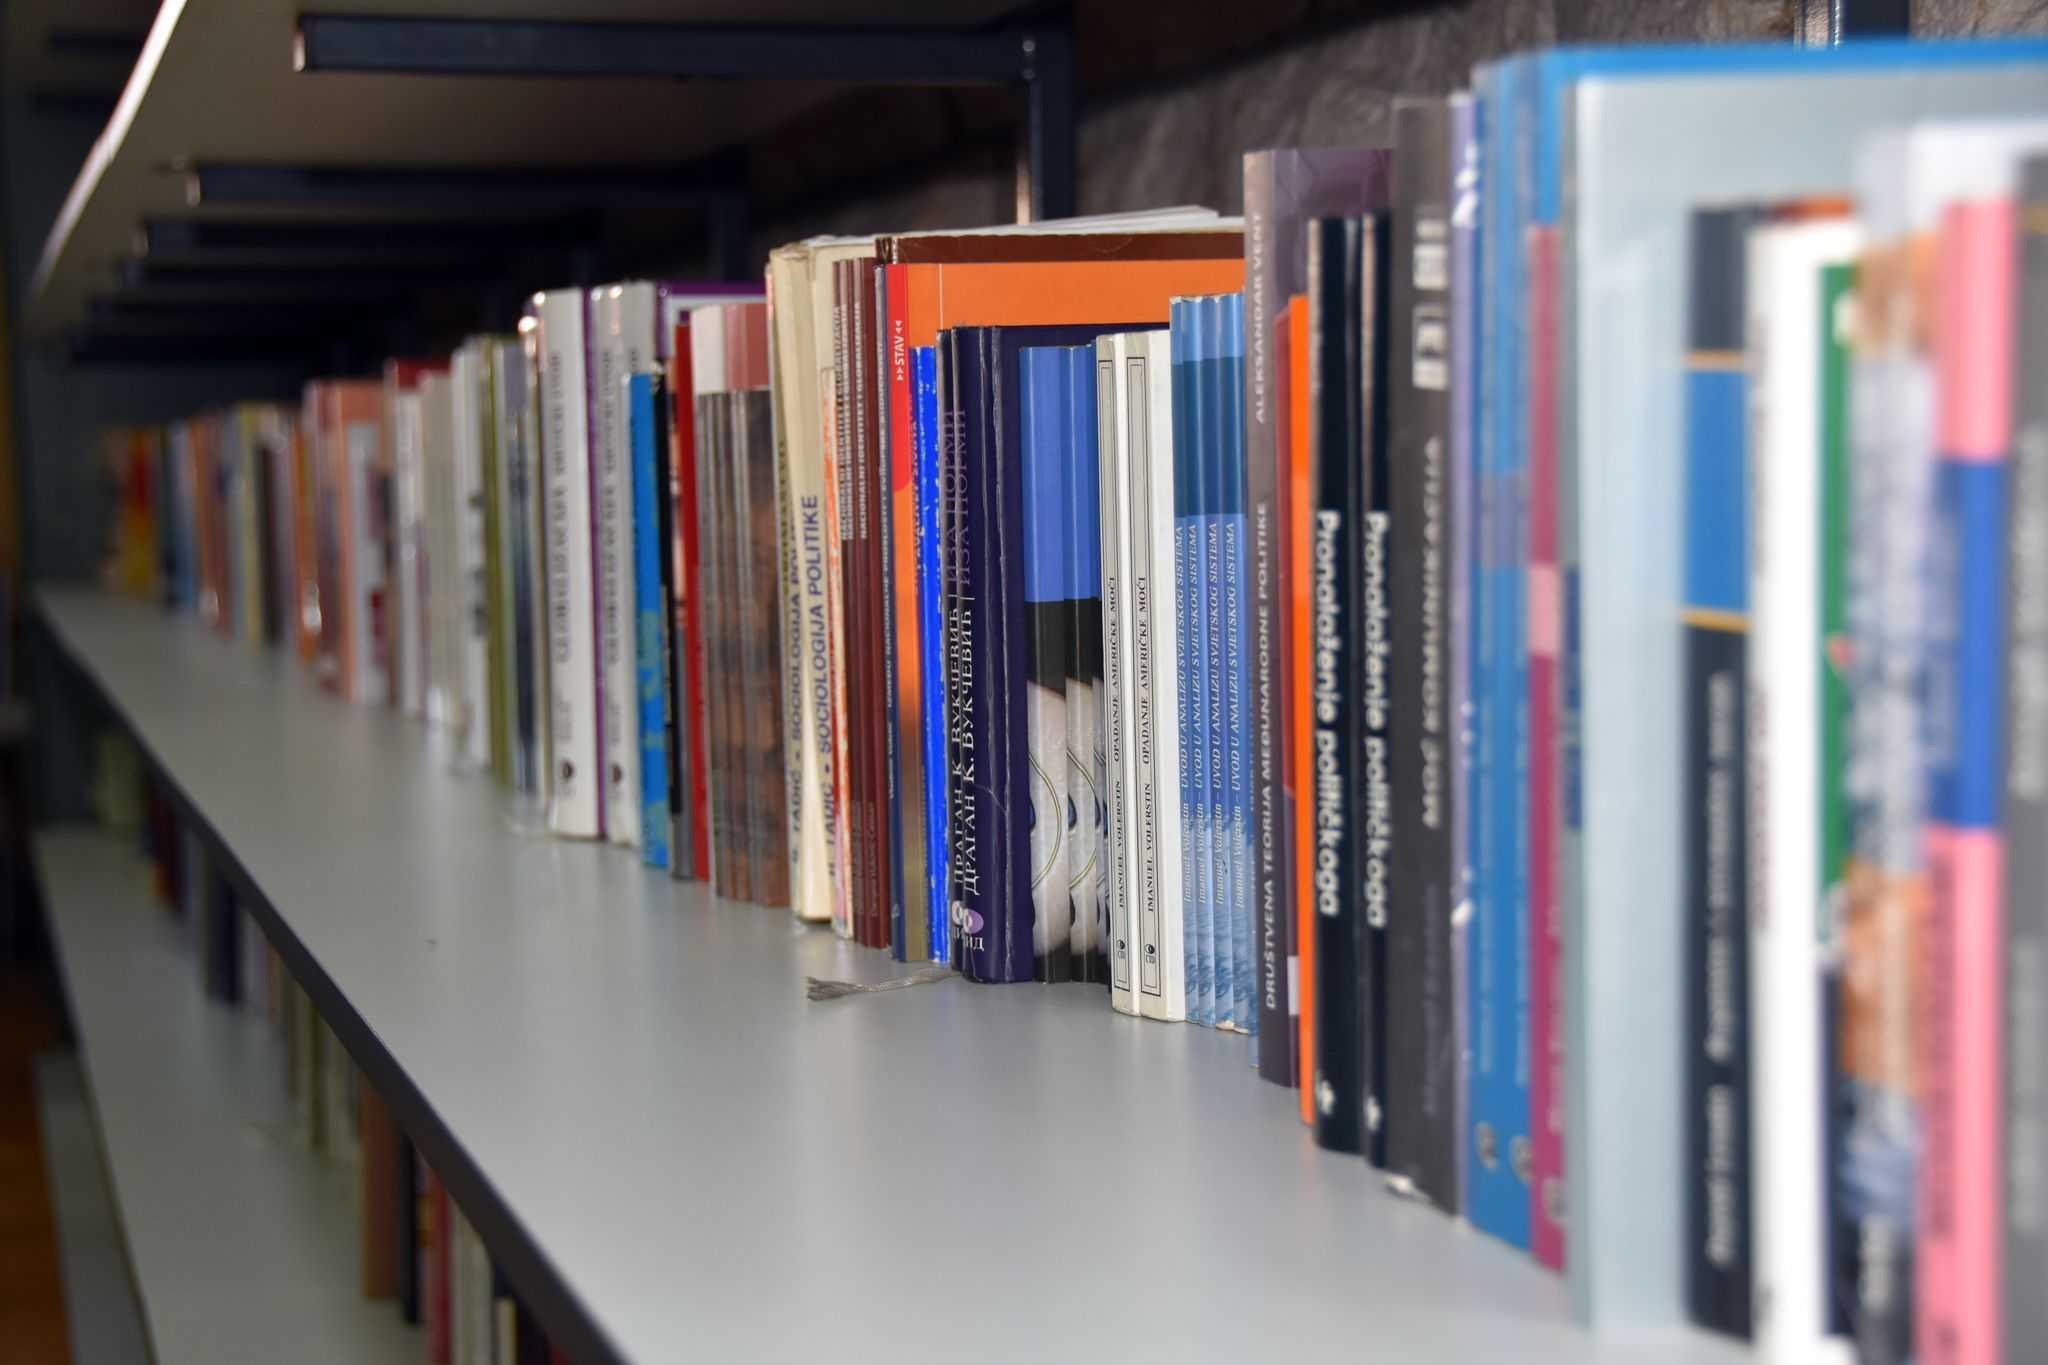 Pripremljen dokument Nabavna politika Centralne univerzitetske biblioteke